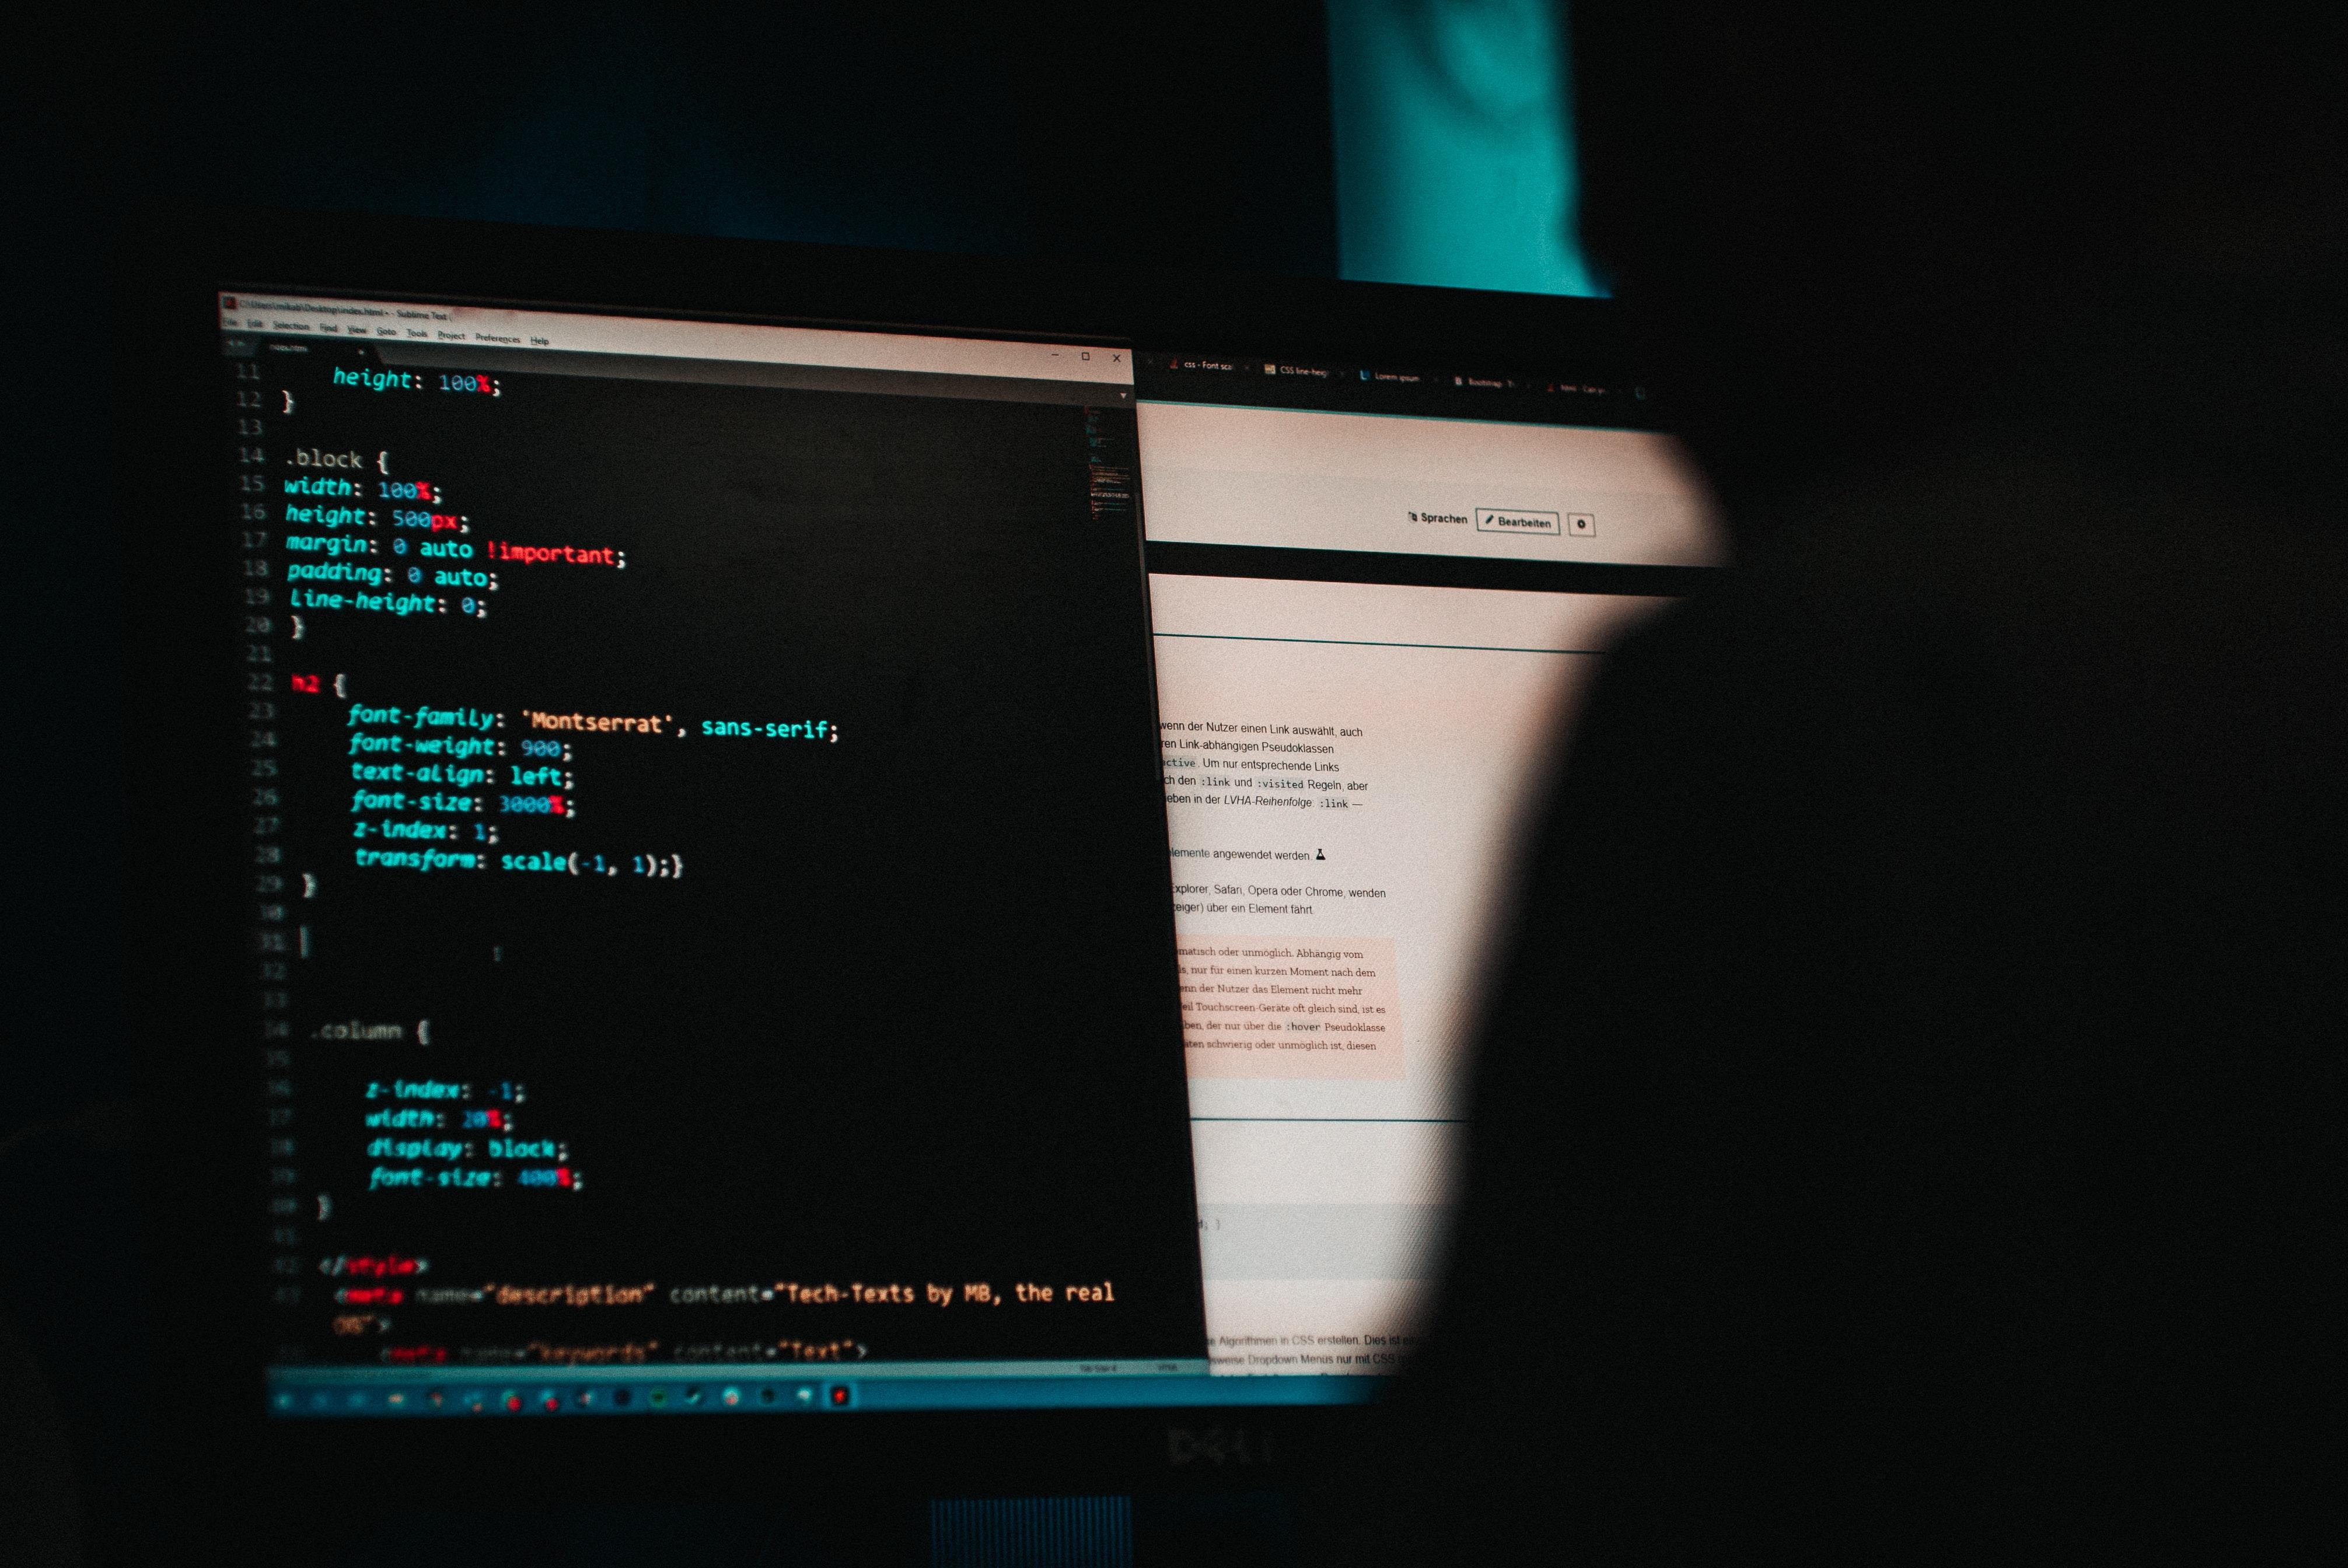 Defi Protocol创始人的个人资金被黑客入侵,损失800万美元 0001